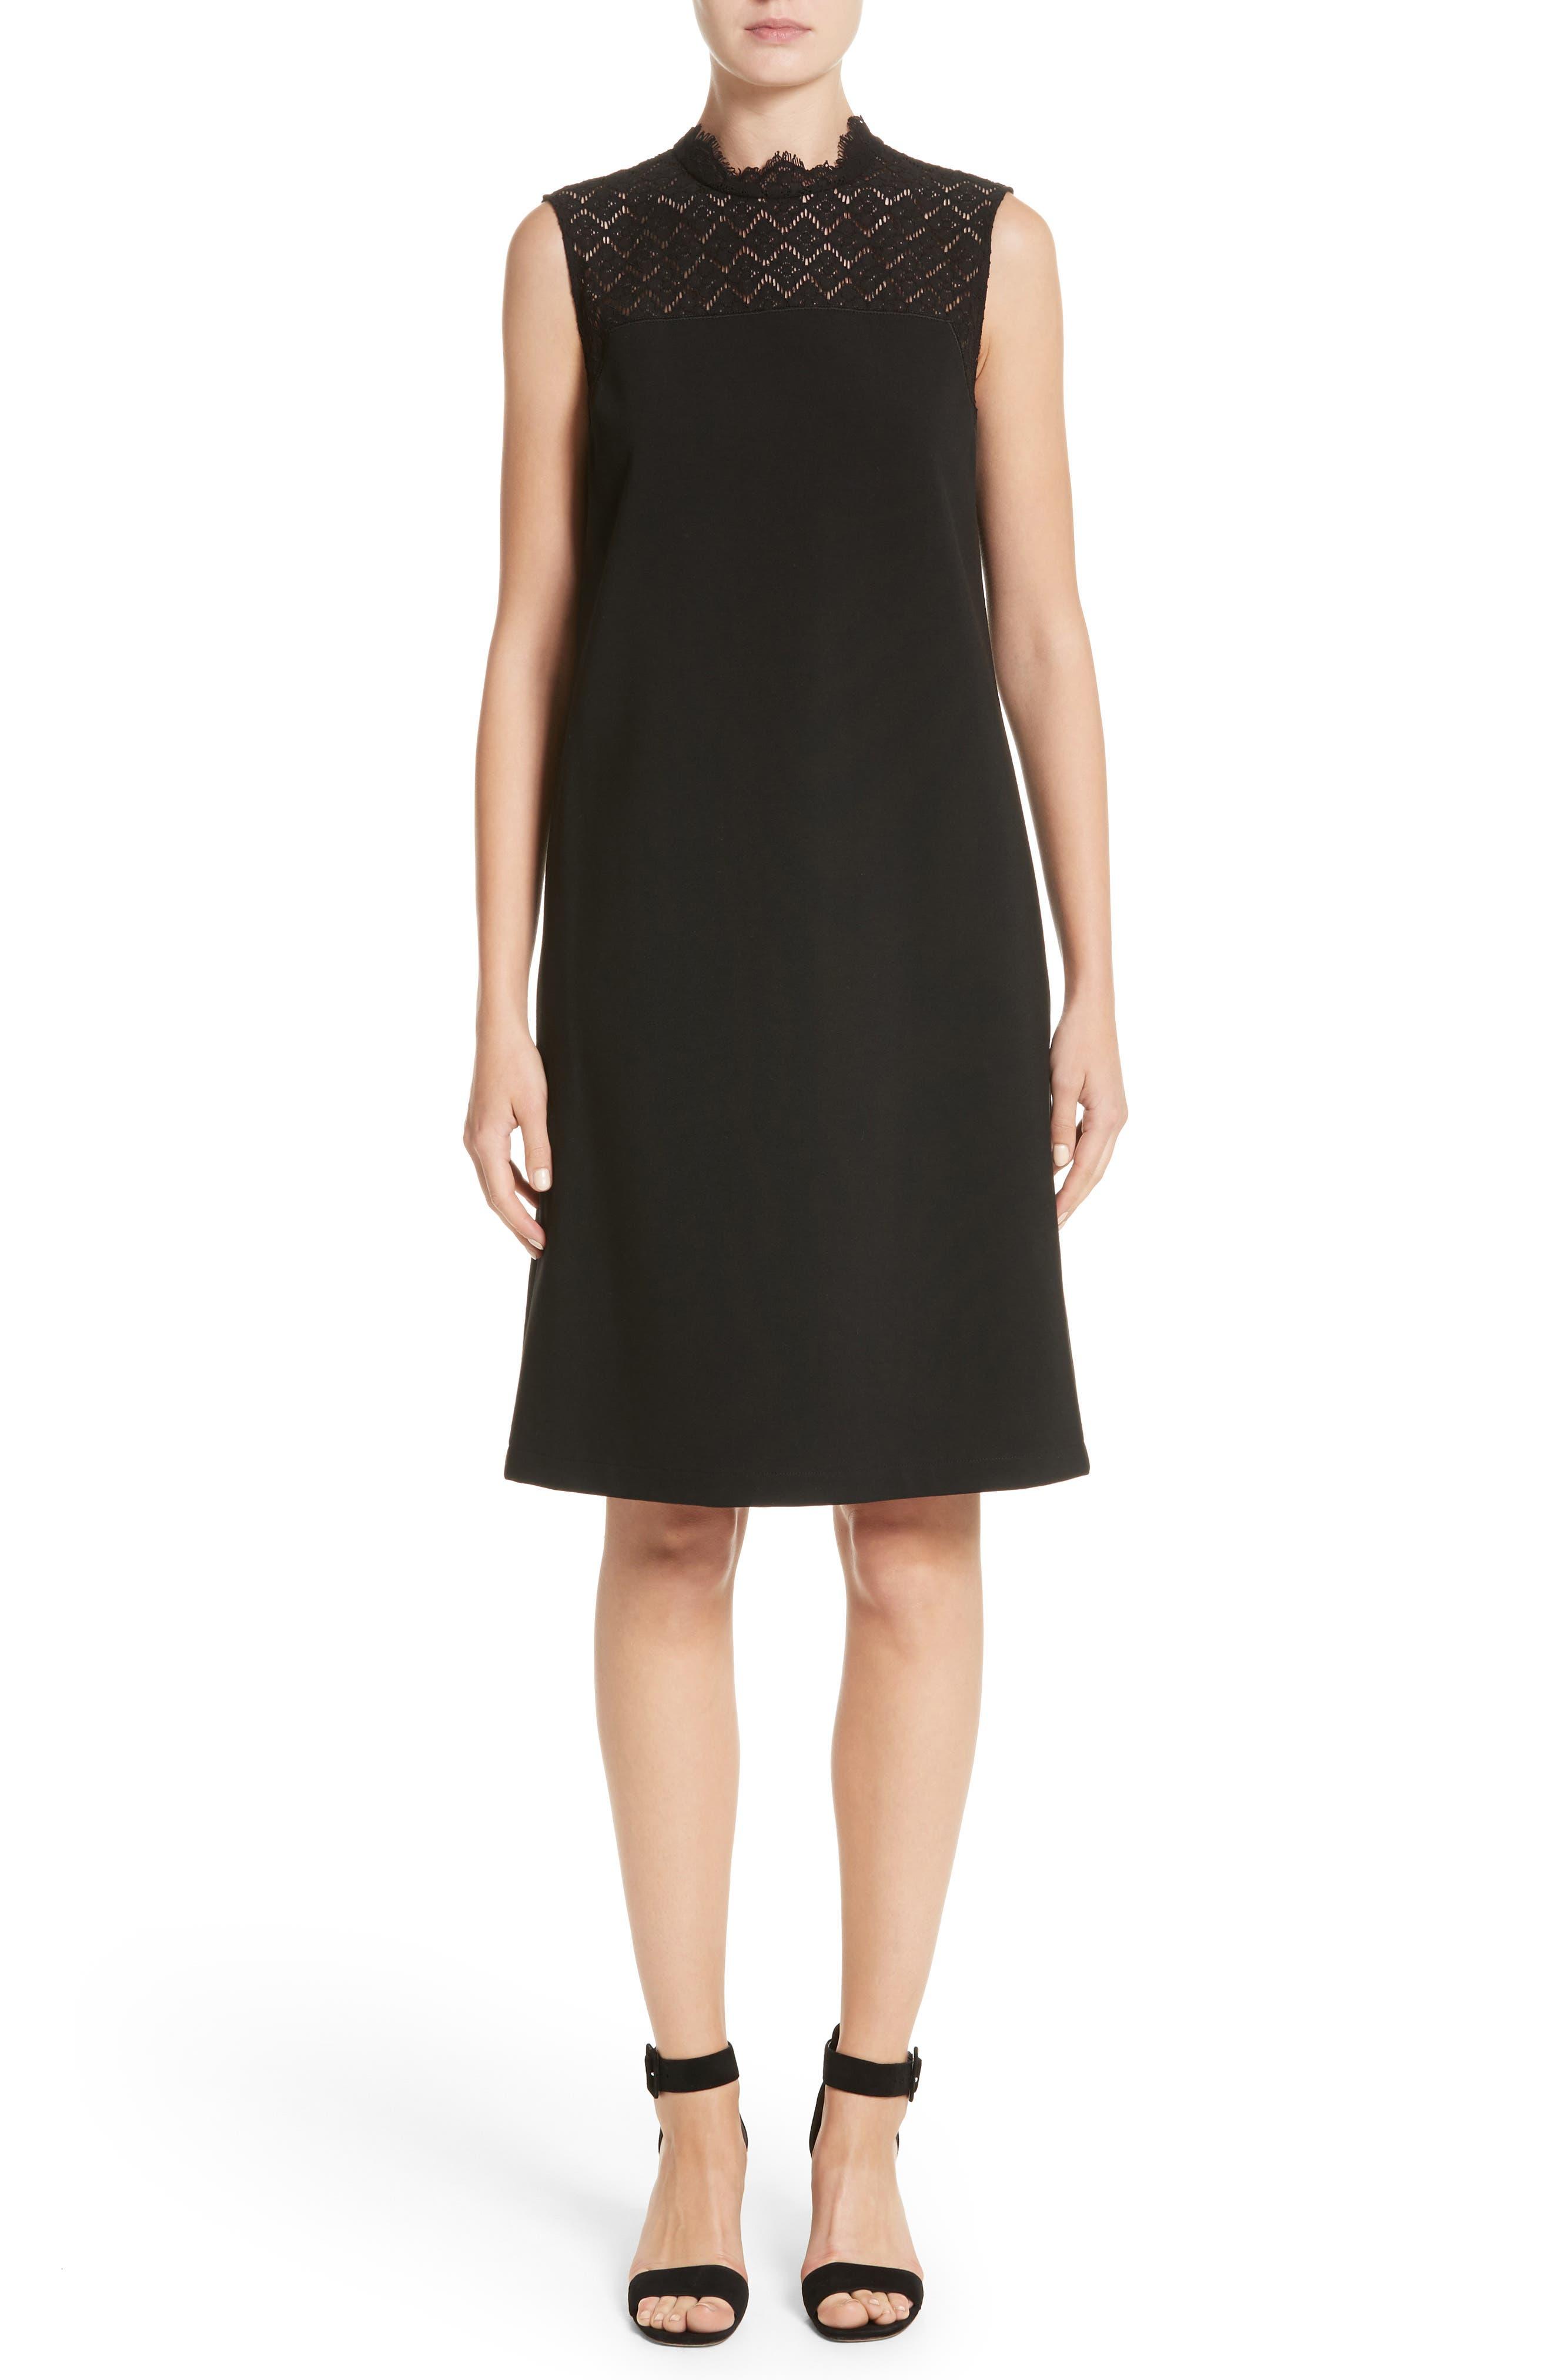 Main Image - Lafayette 148 New York Ines Lace Trim Shift Dress